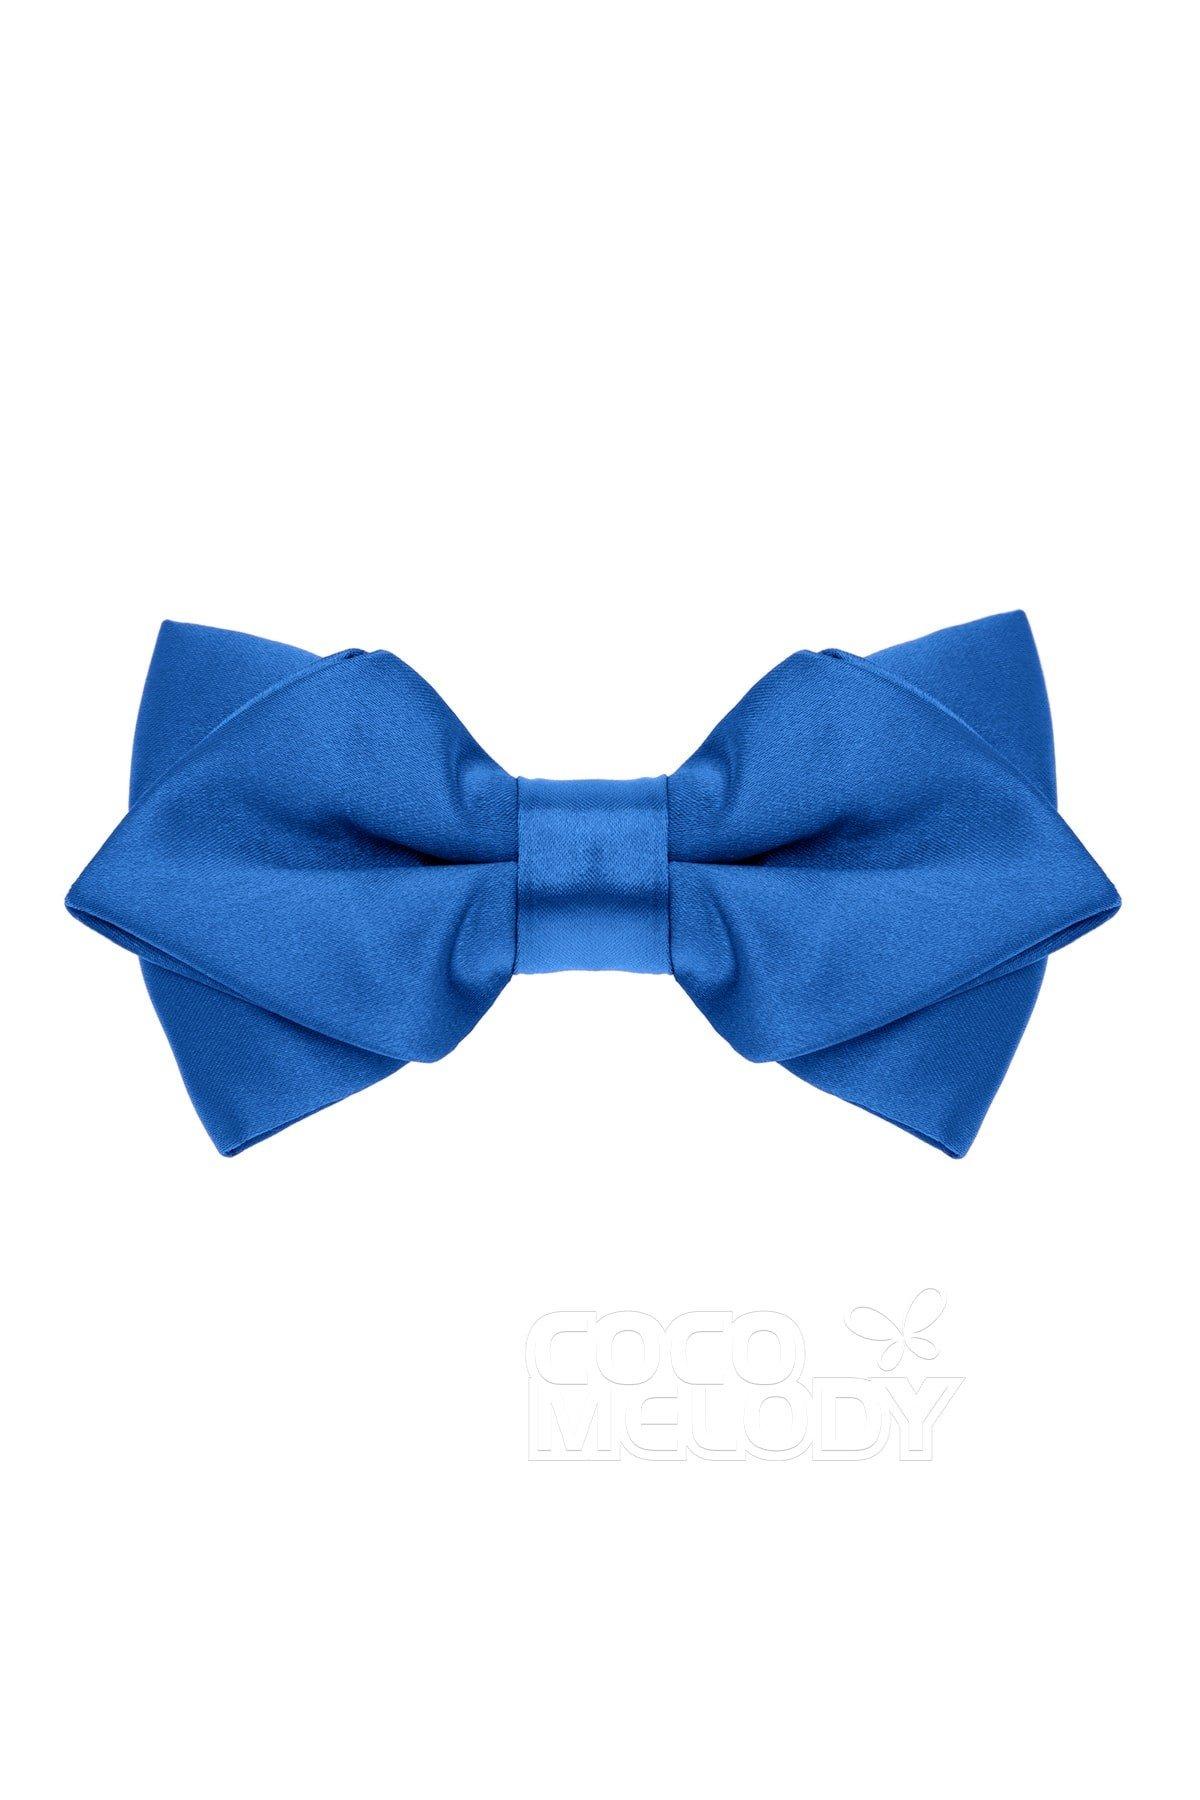 s elastic silk like satin bow ties cz170015